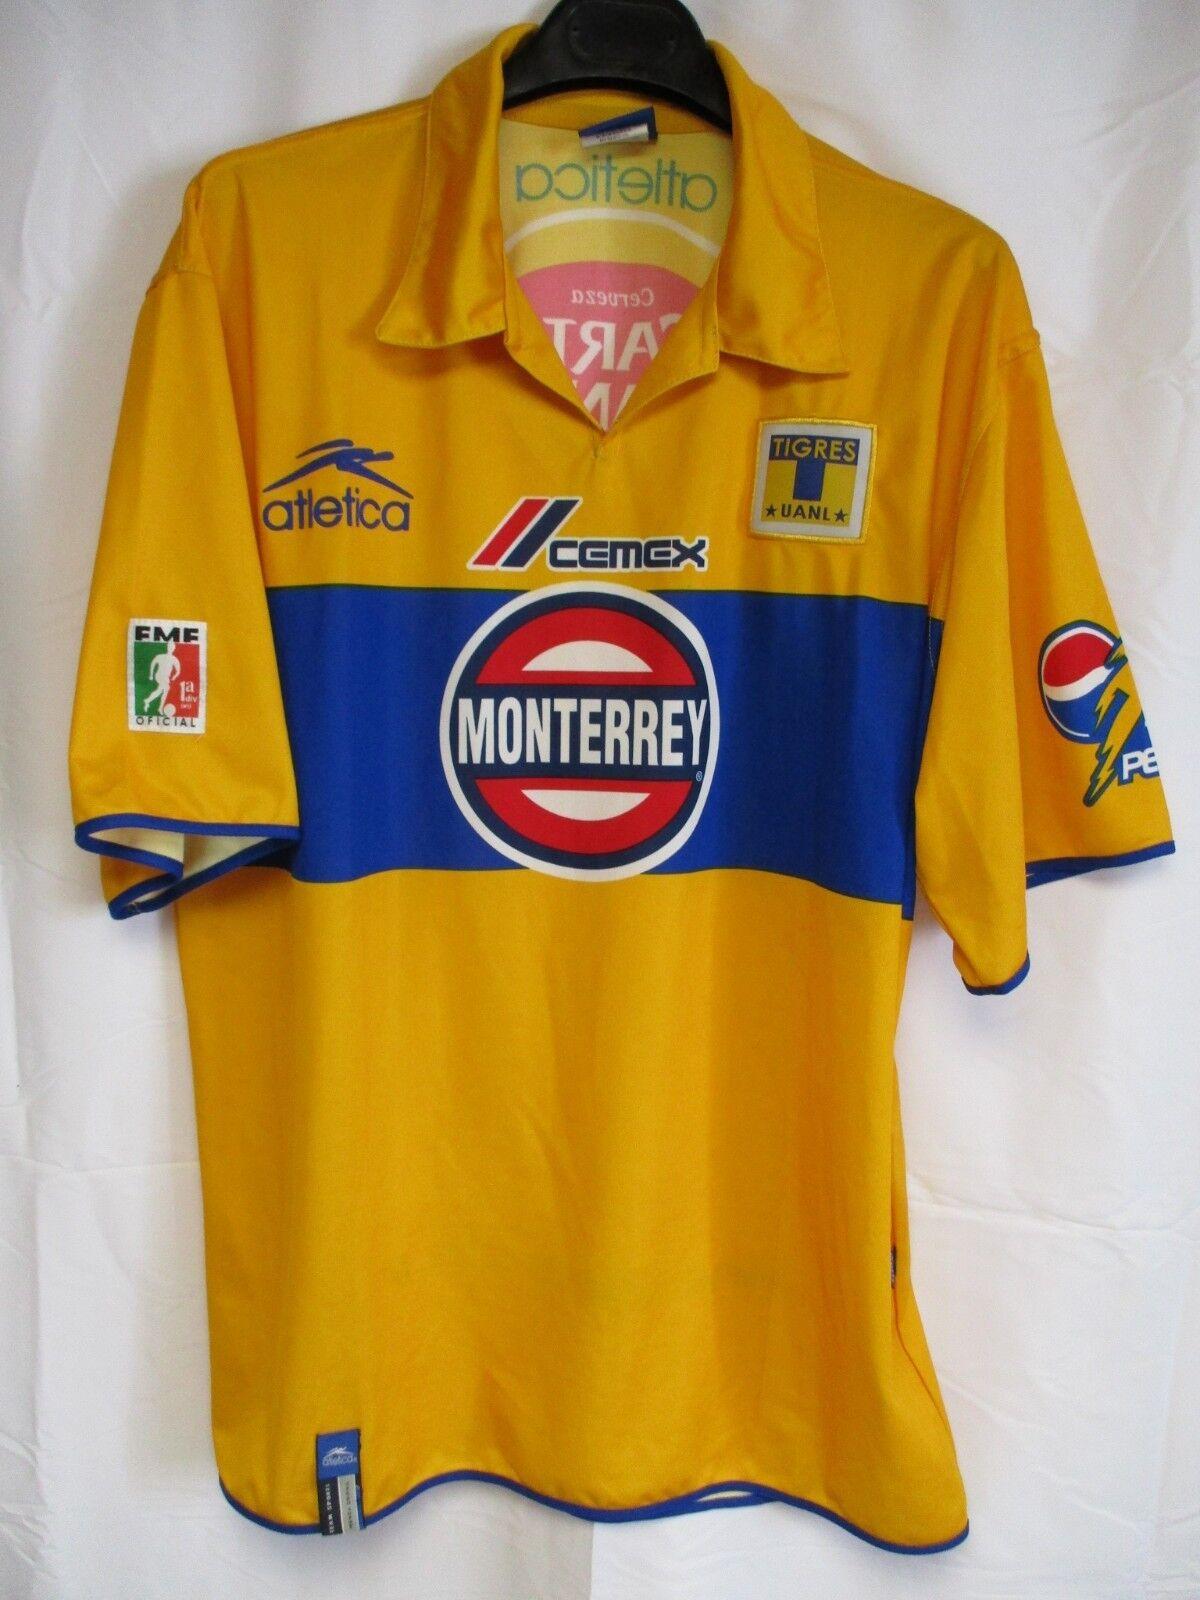 Maillot TIGRES MONTERREY UANL ATLETICA jersey shirt camiseta football maglia XL